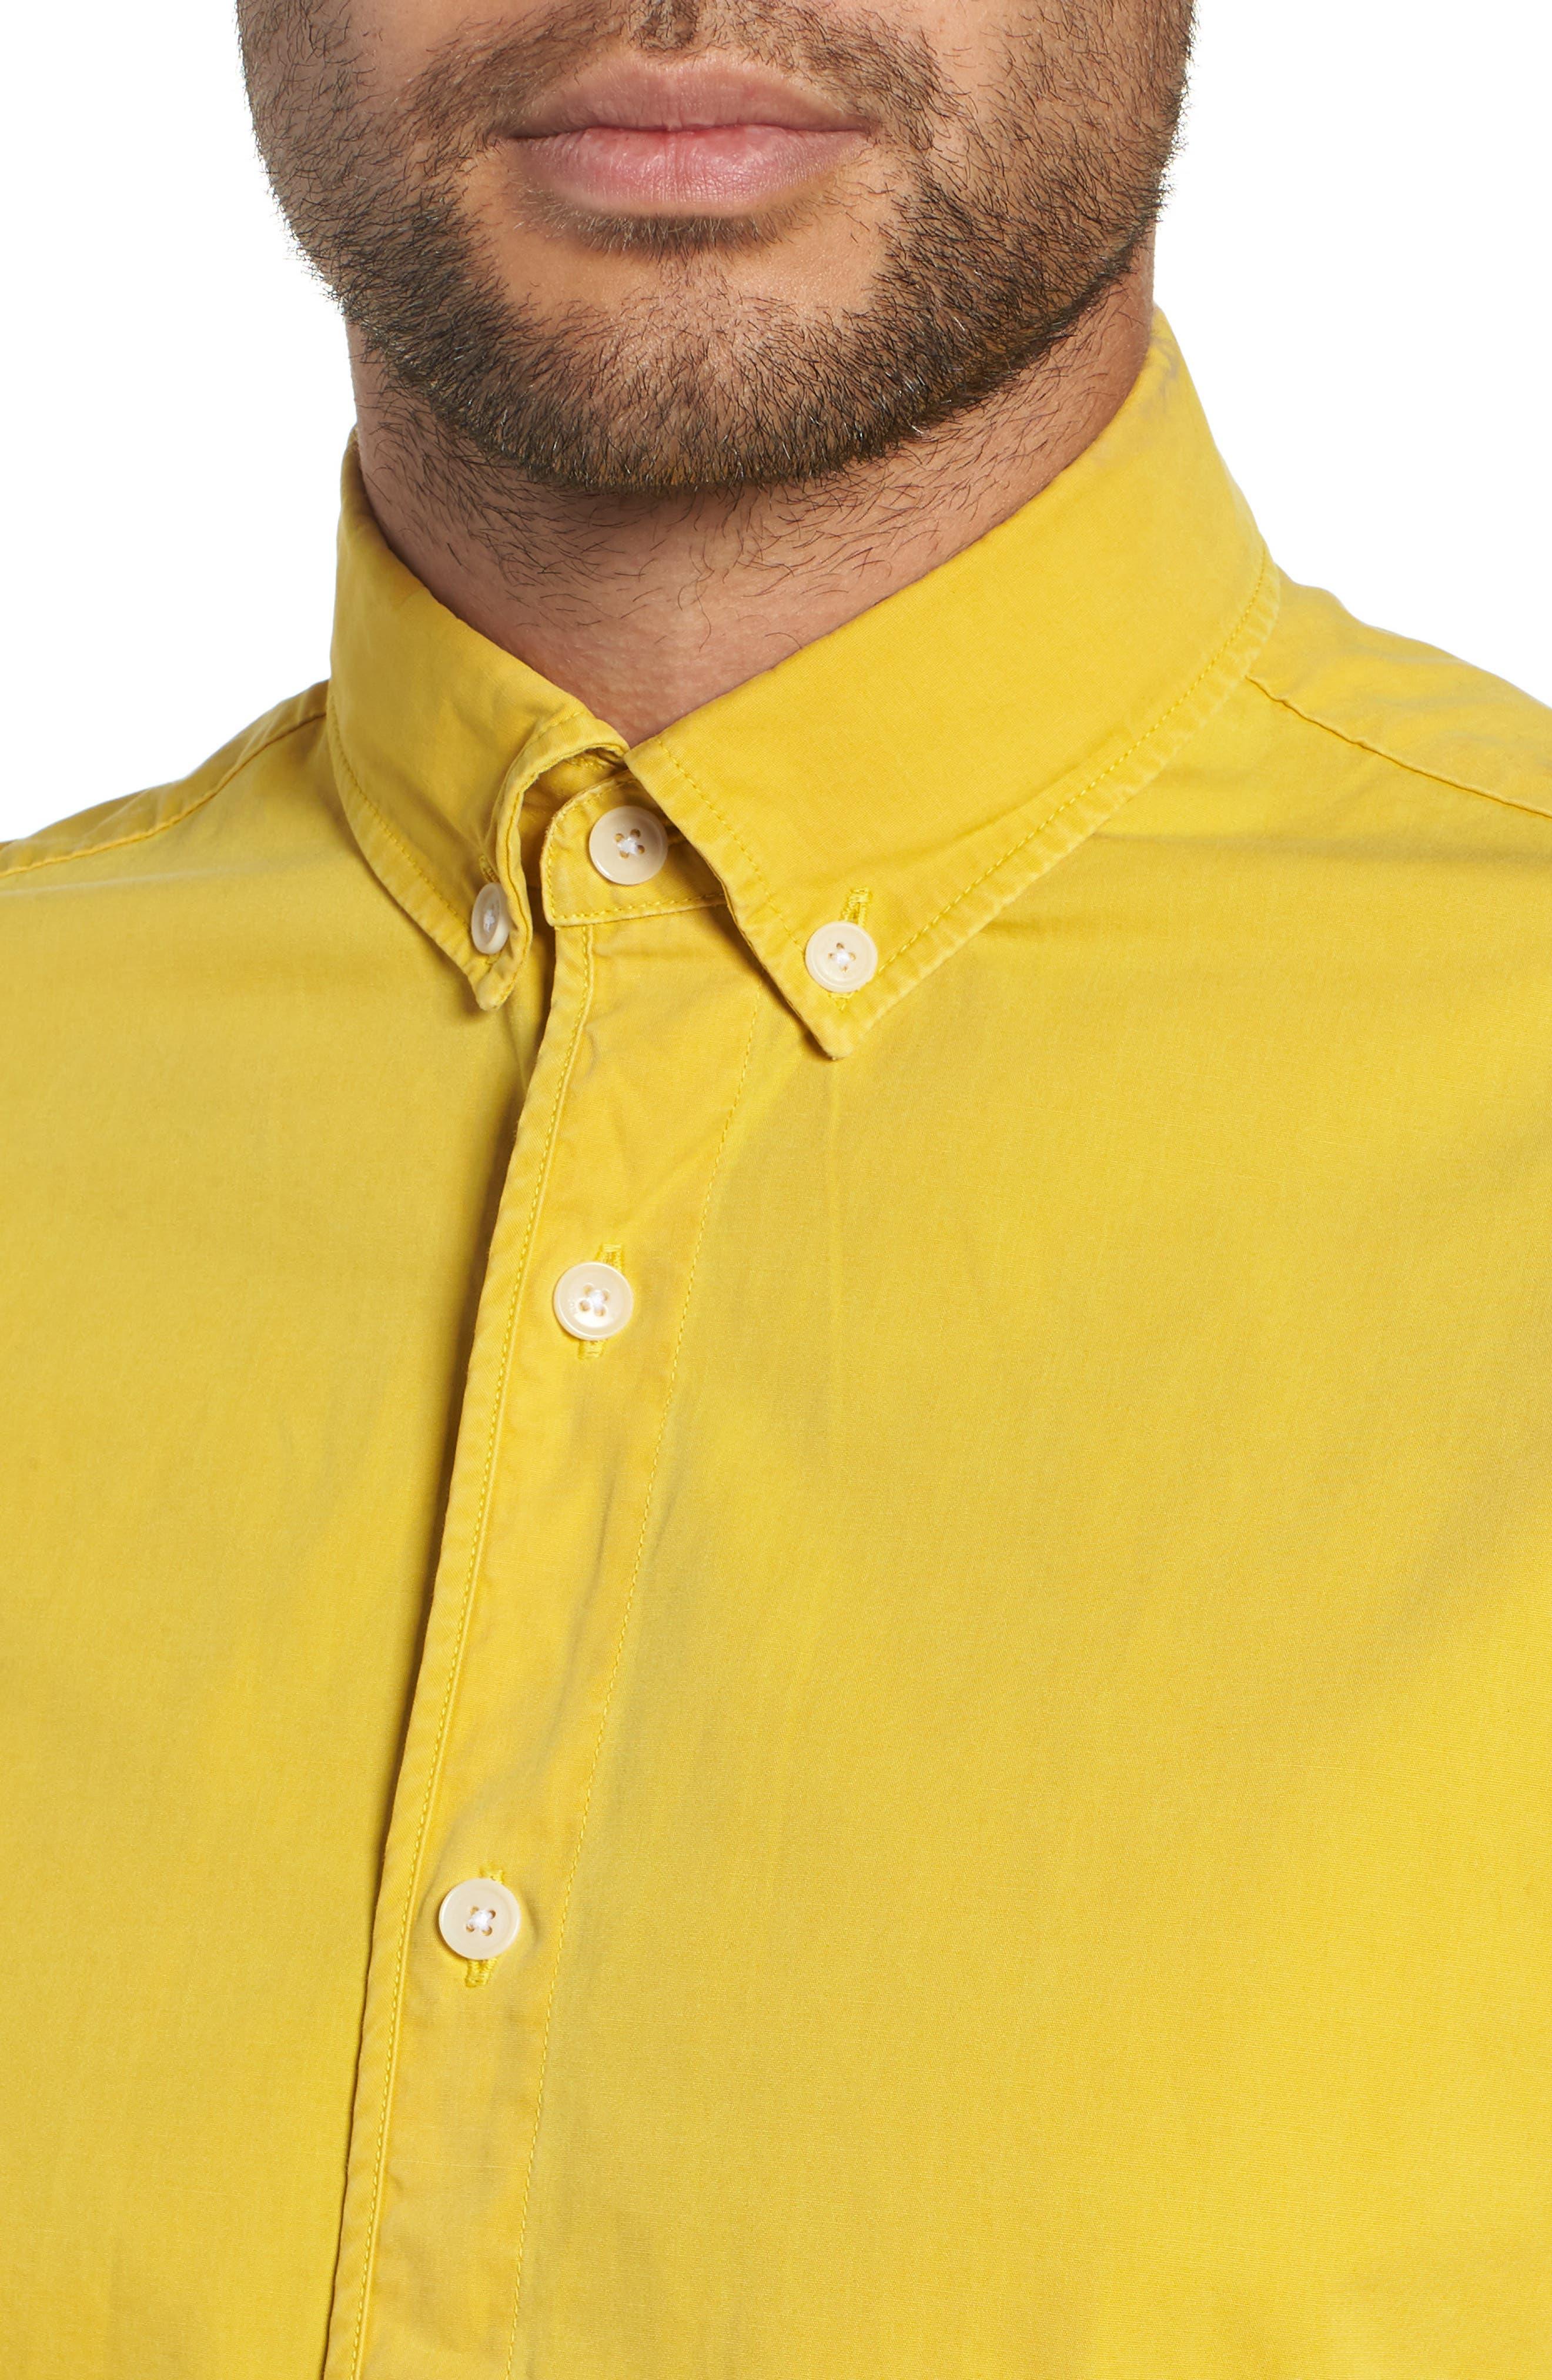 Bampton Solid Sport Shirt,                             Alternate thumbnail 2, color,                             LEMON